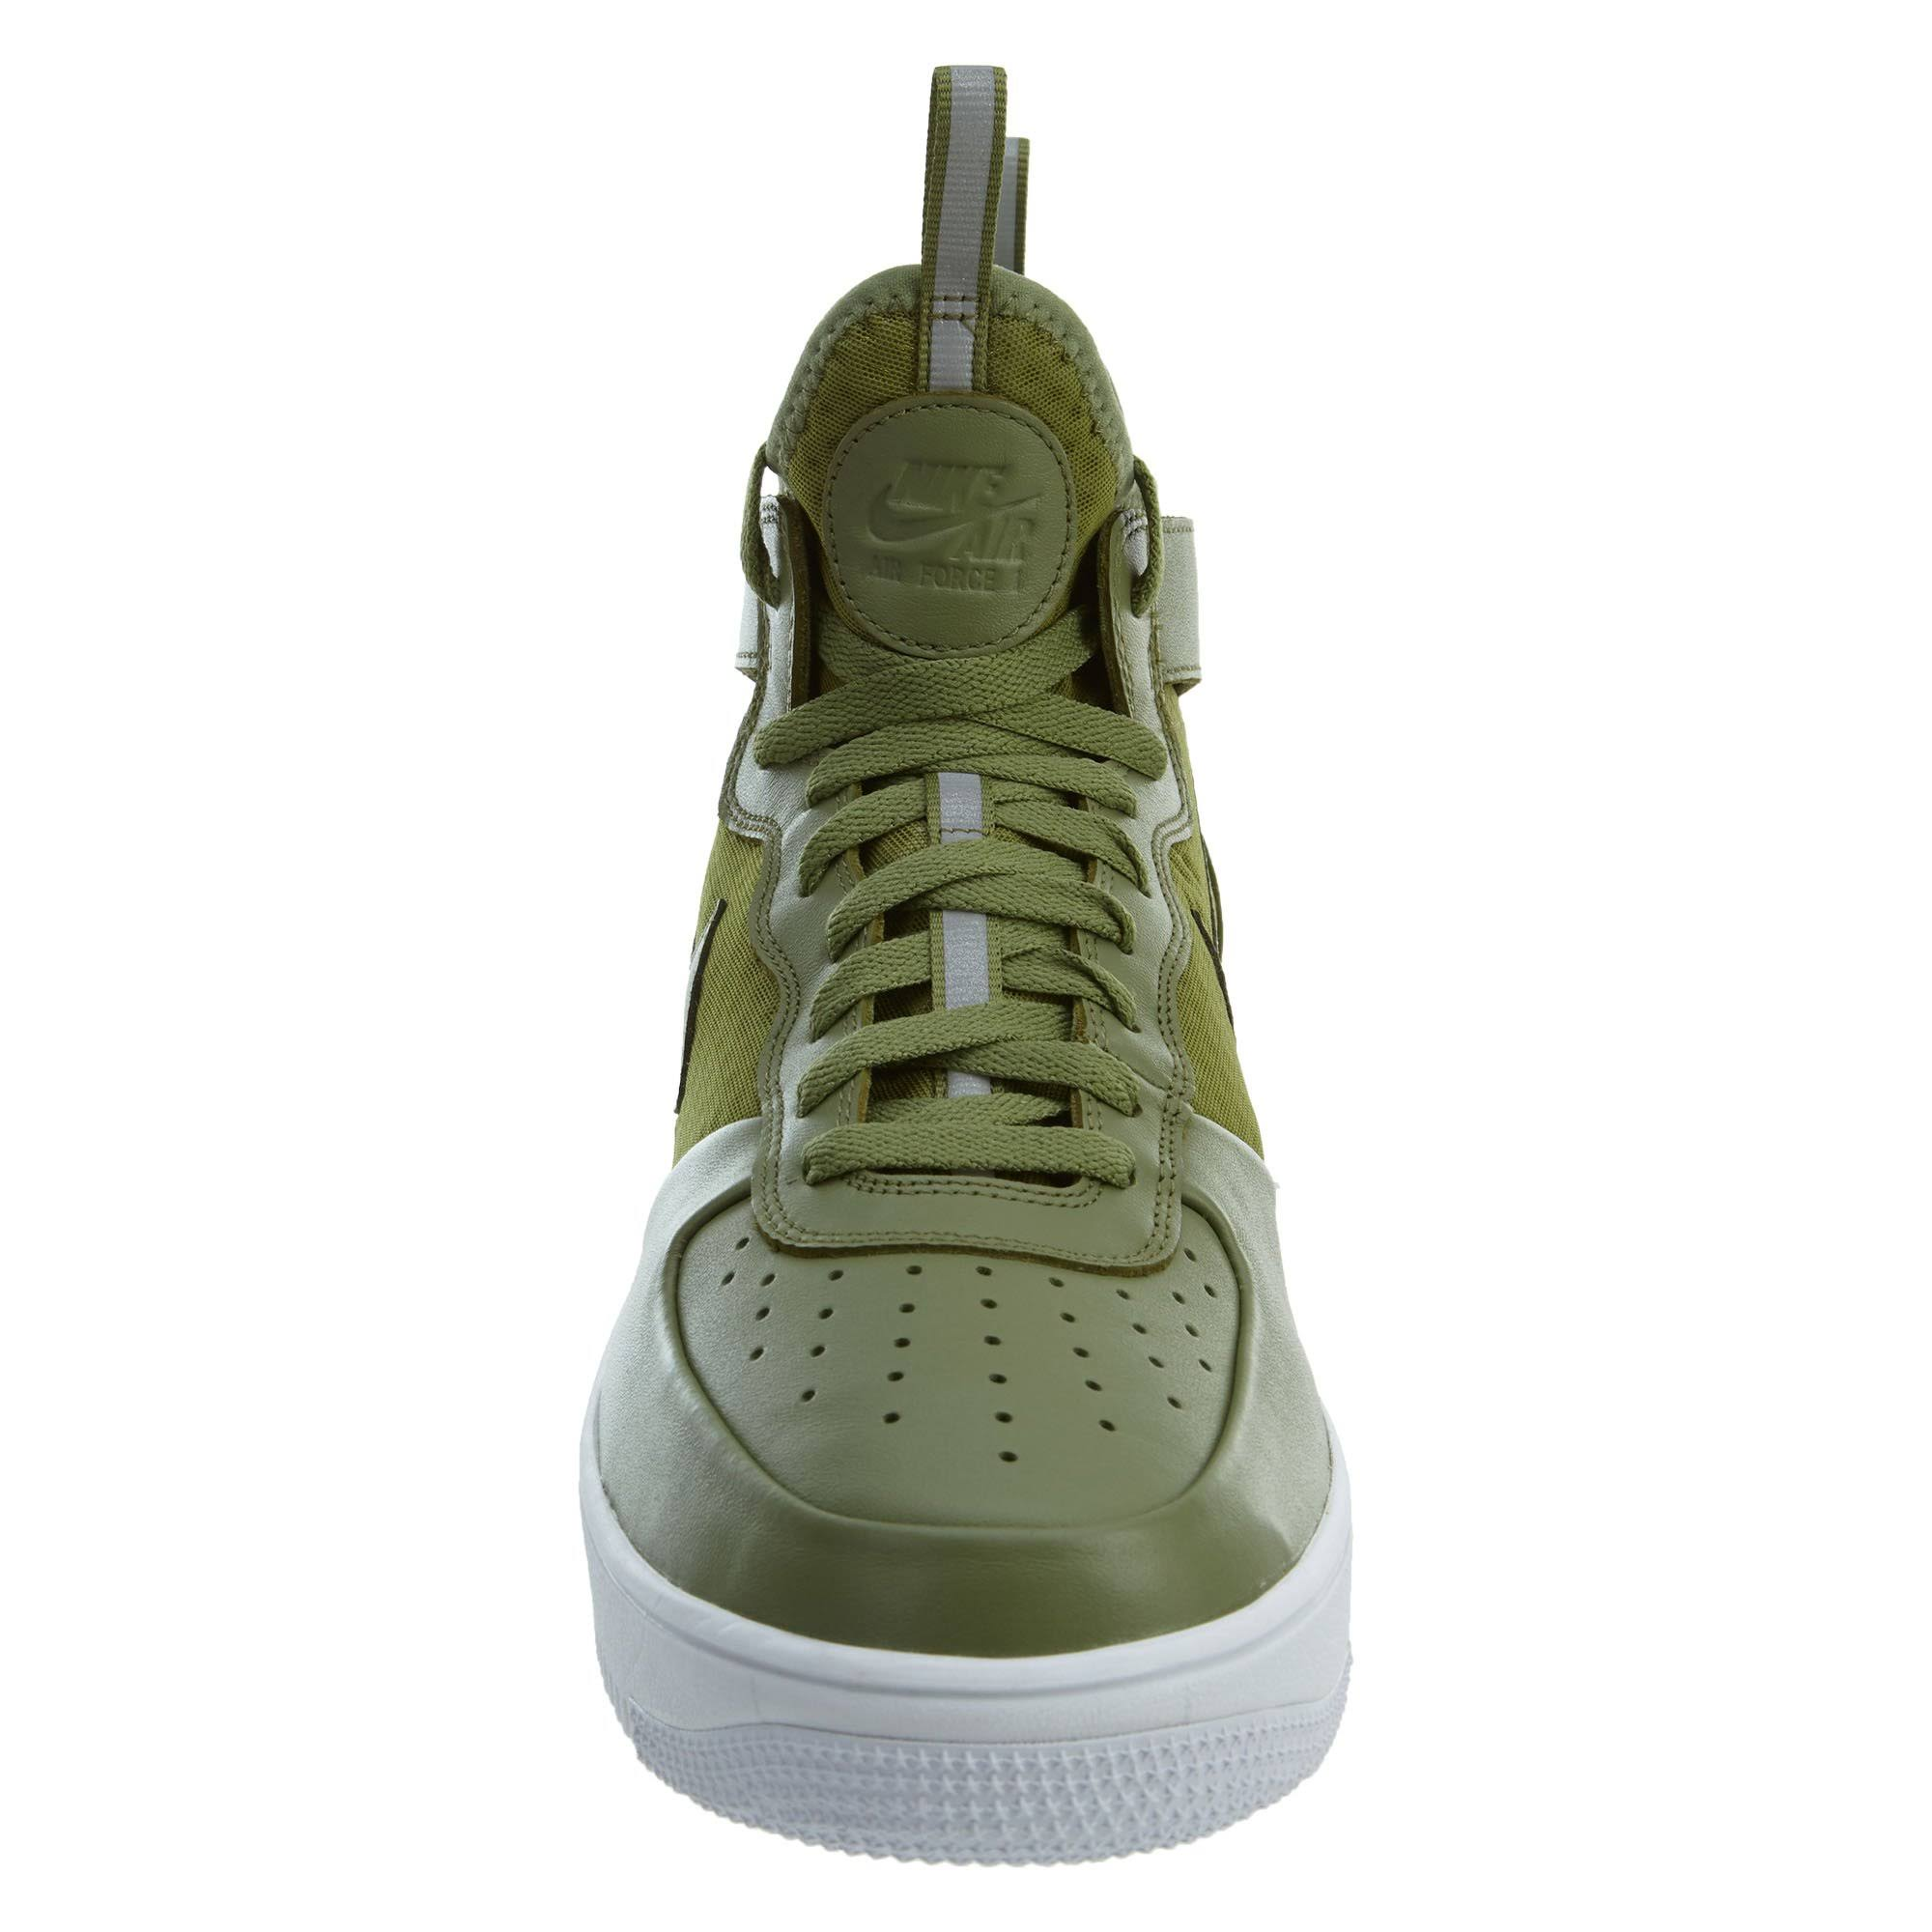 1 Force Mid Ultraforce Nike Green palm Palm Green 864014 Air Style Mens 8 white IxwqIHEC